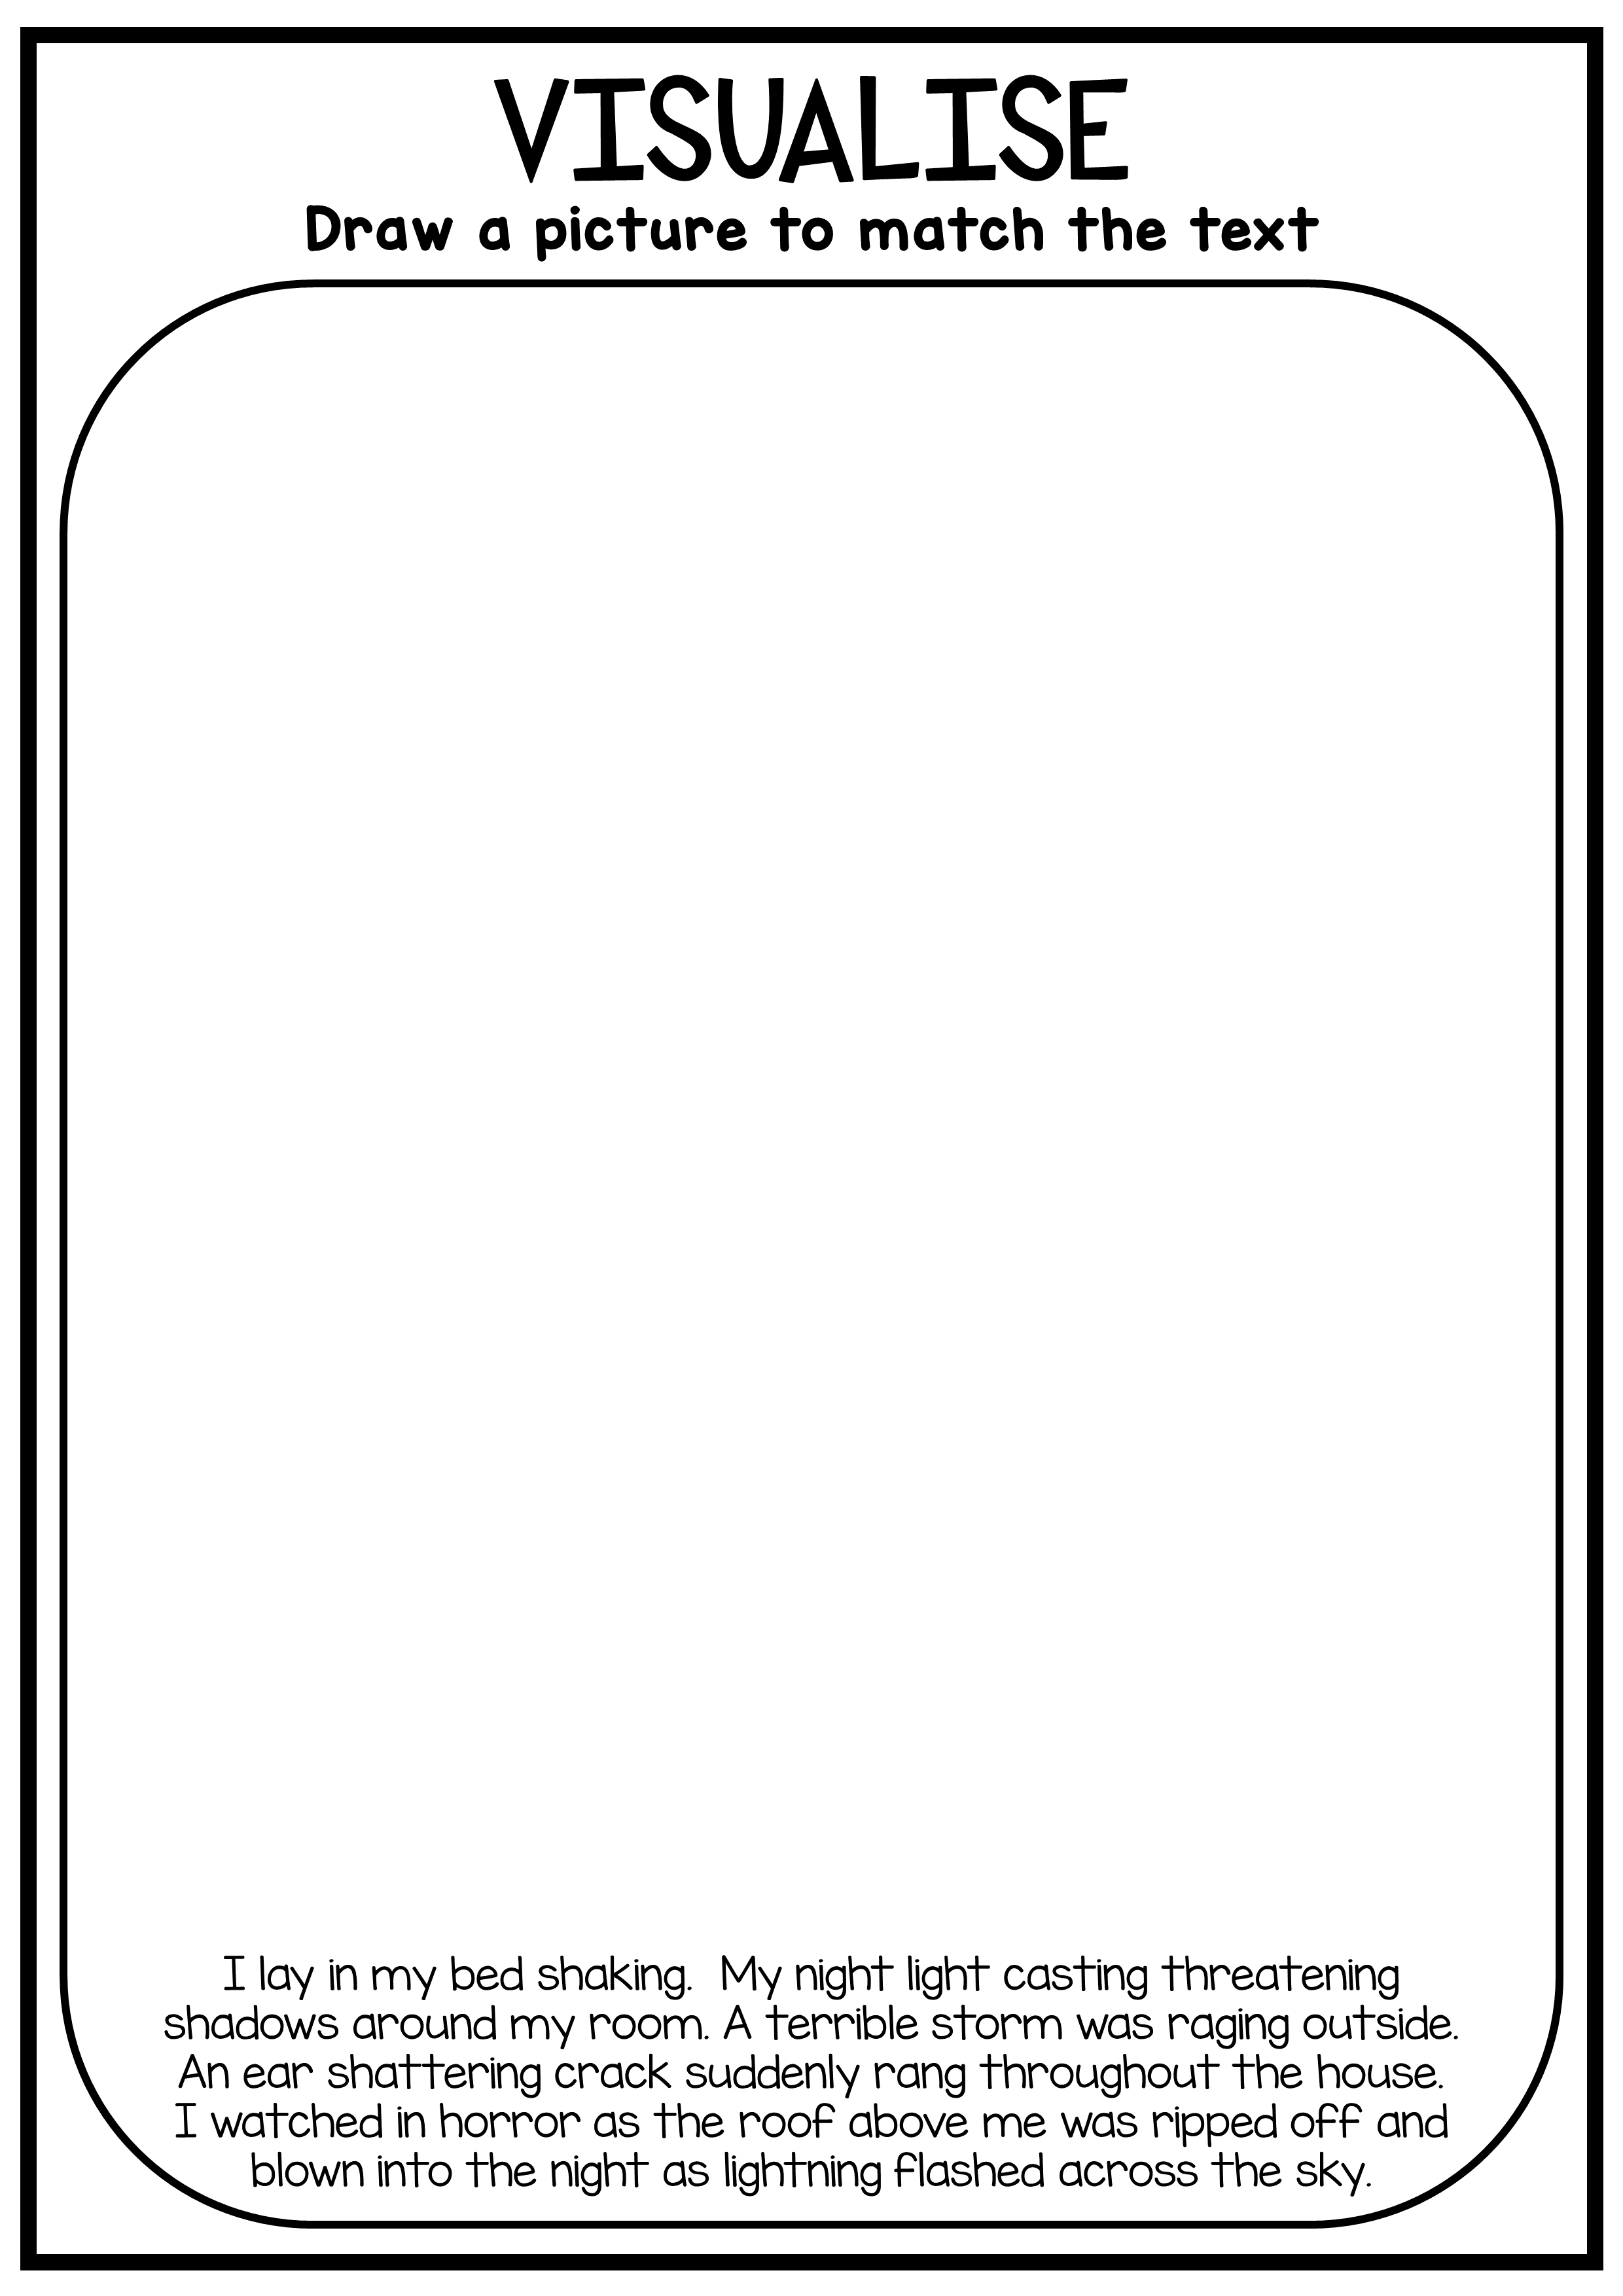 small resolution of Visualizing (Visualising) - Reading Worksheet Pack   Reading worksheets